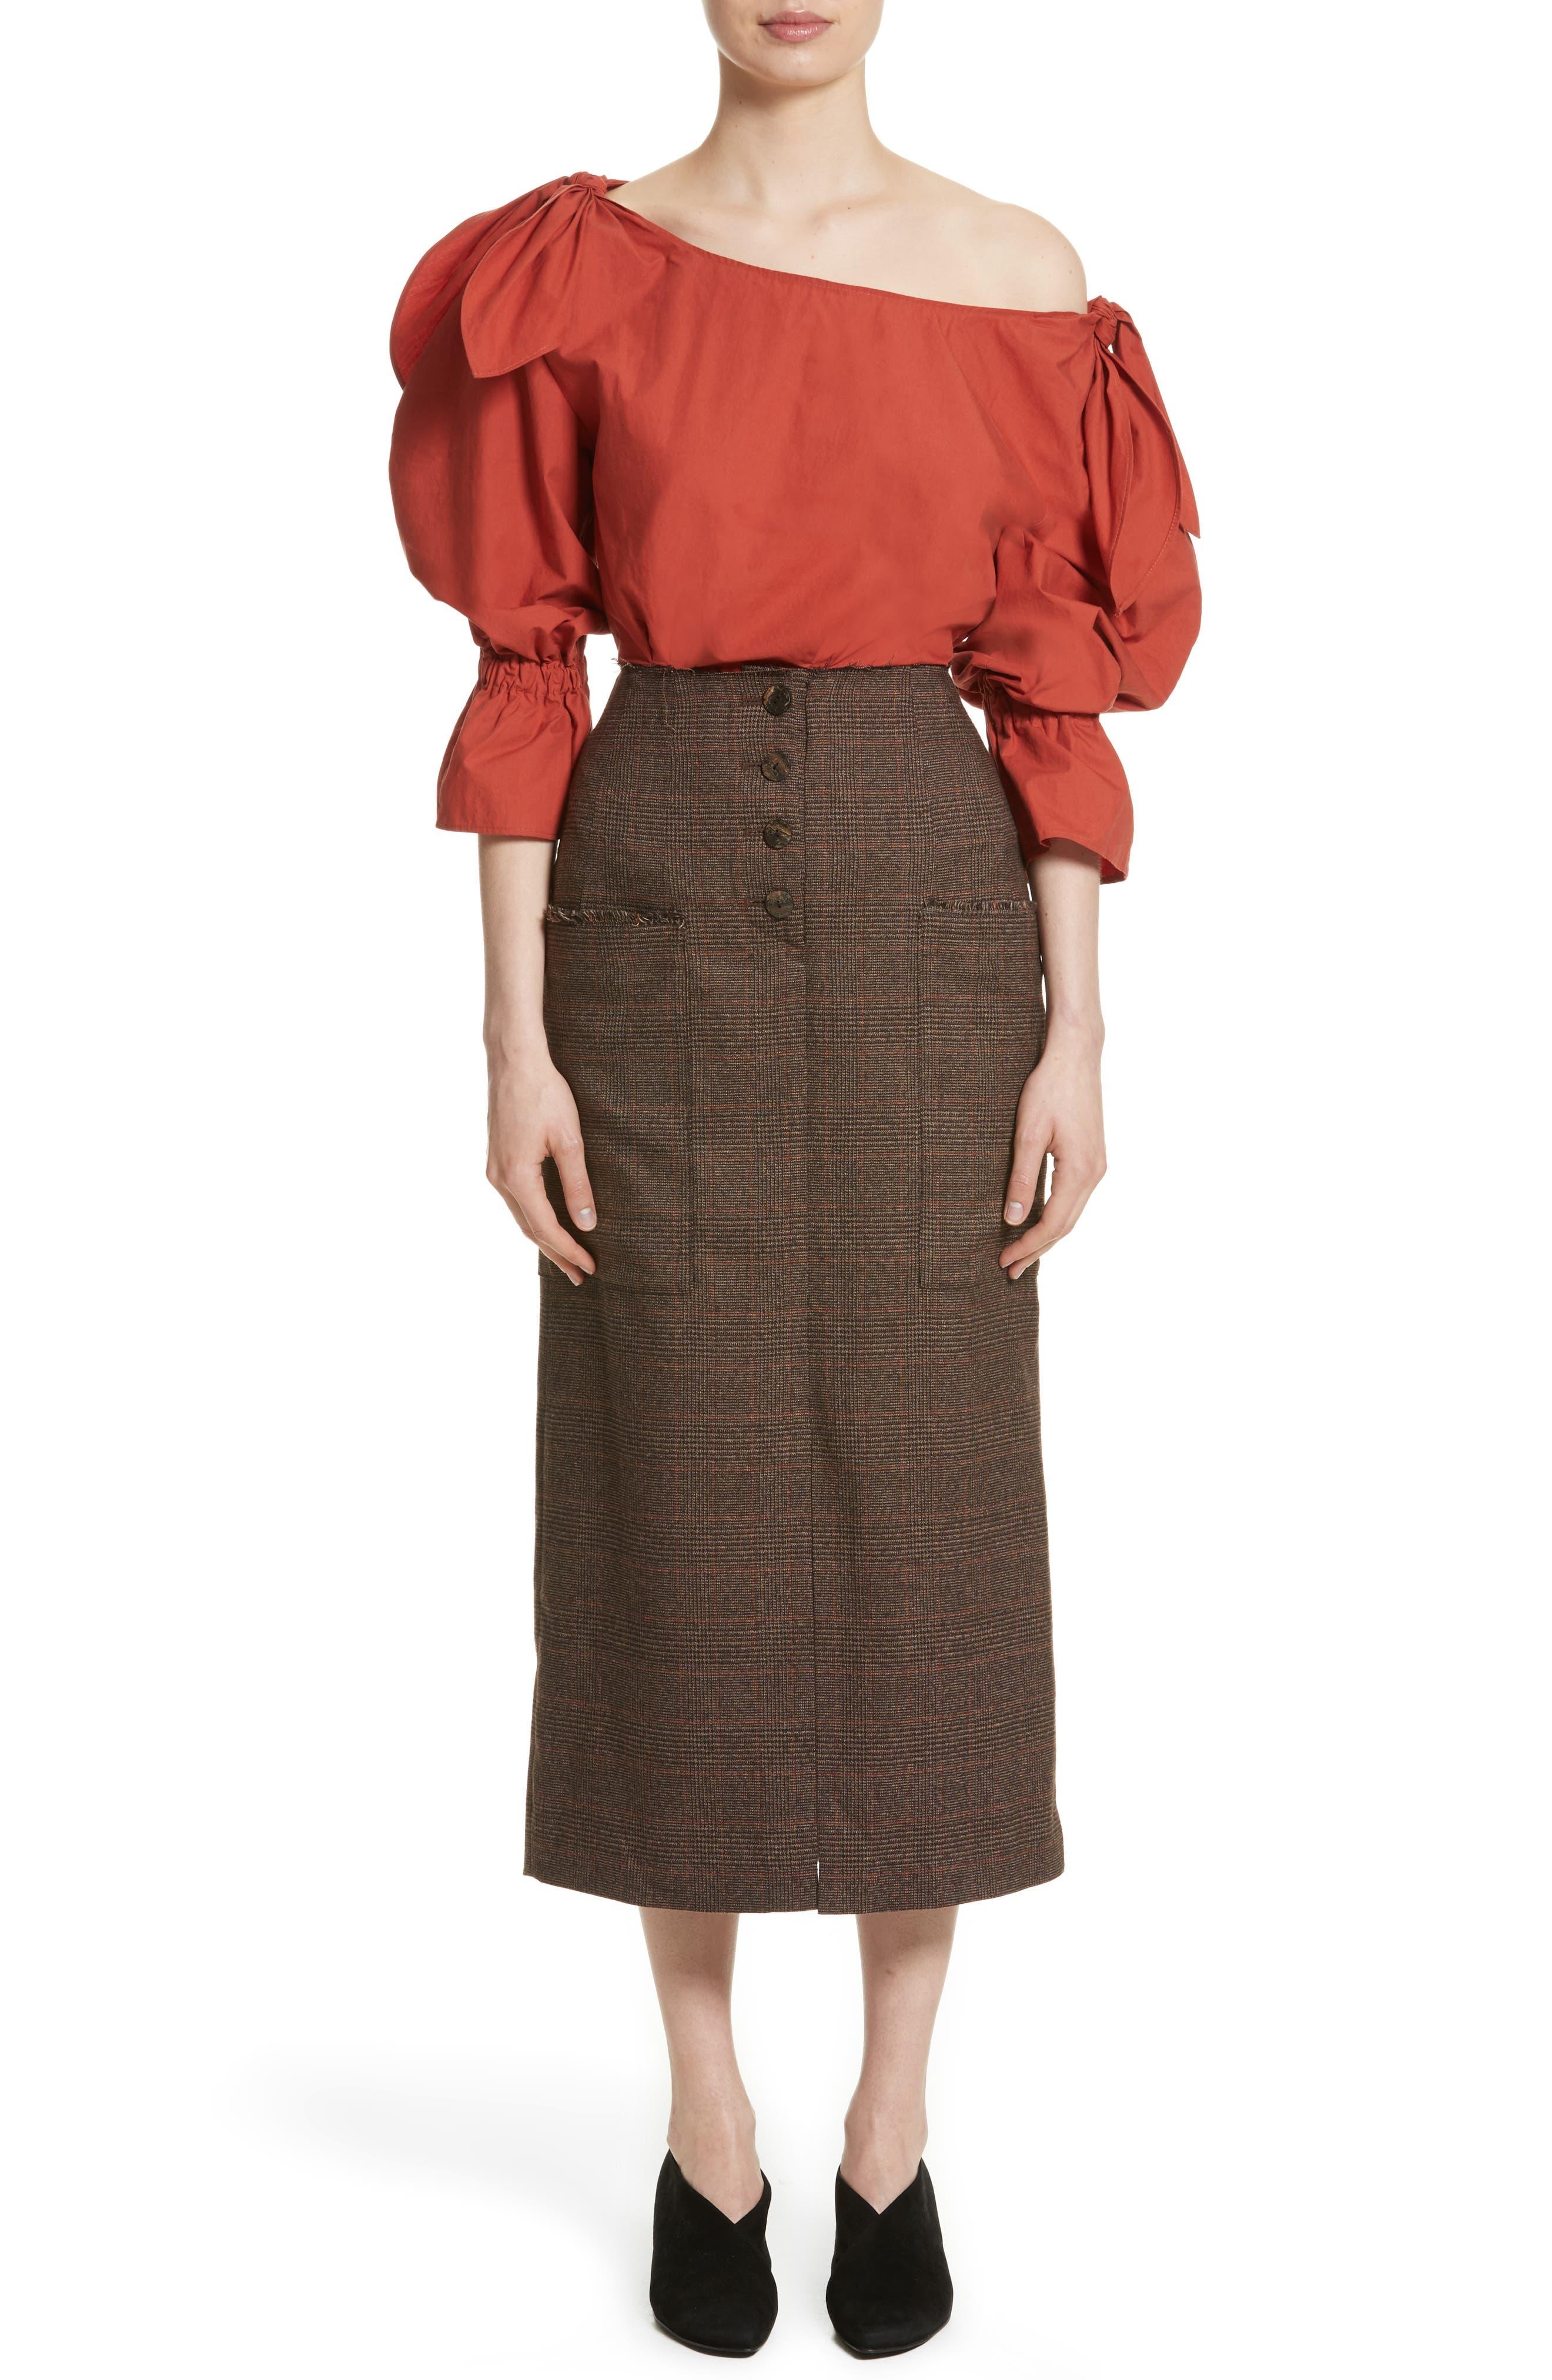 Michelle One-Shoulder Puff Sleeve Blouse,                             Alternate thumbnail 6, color,                             810